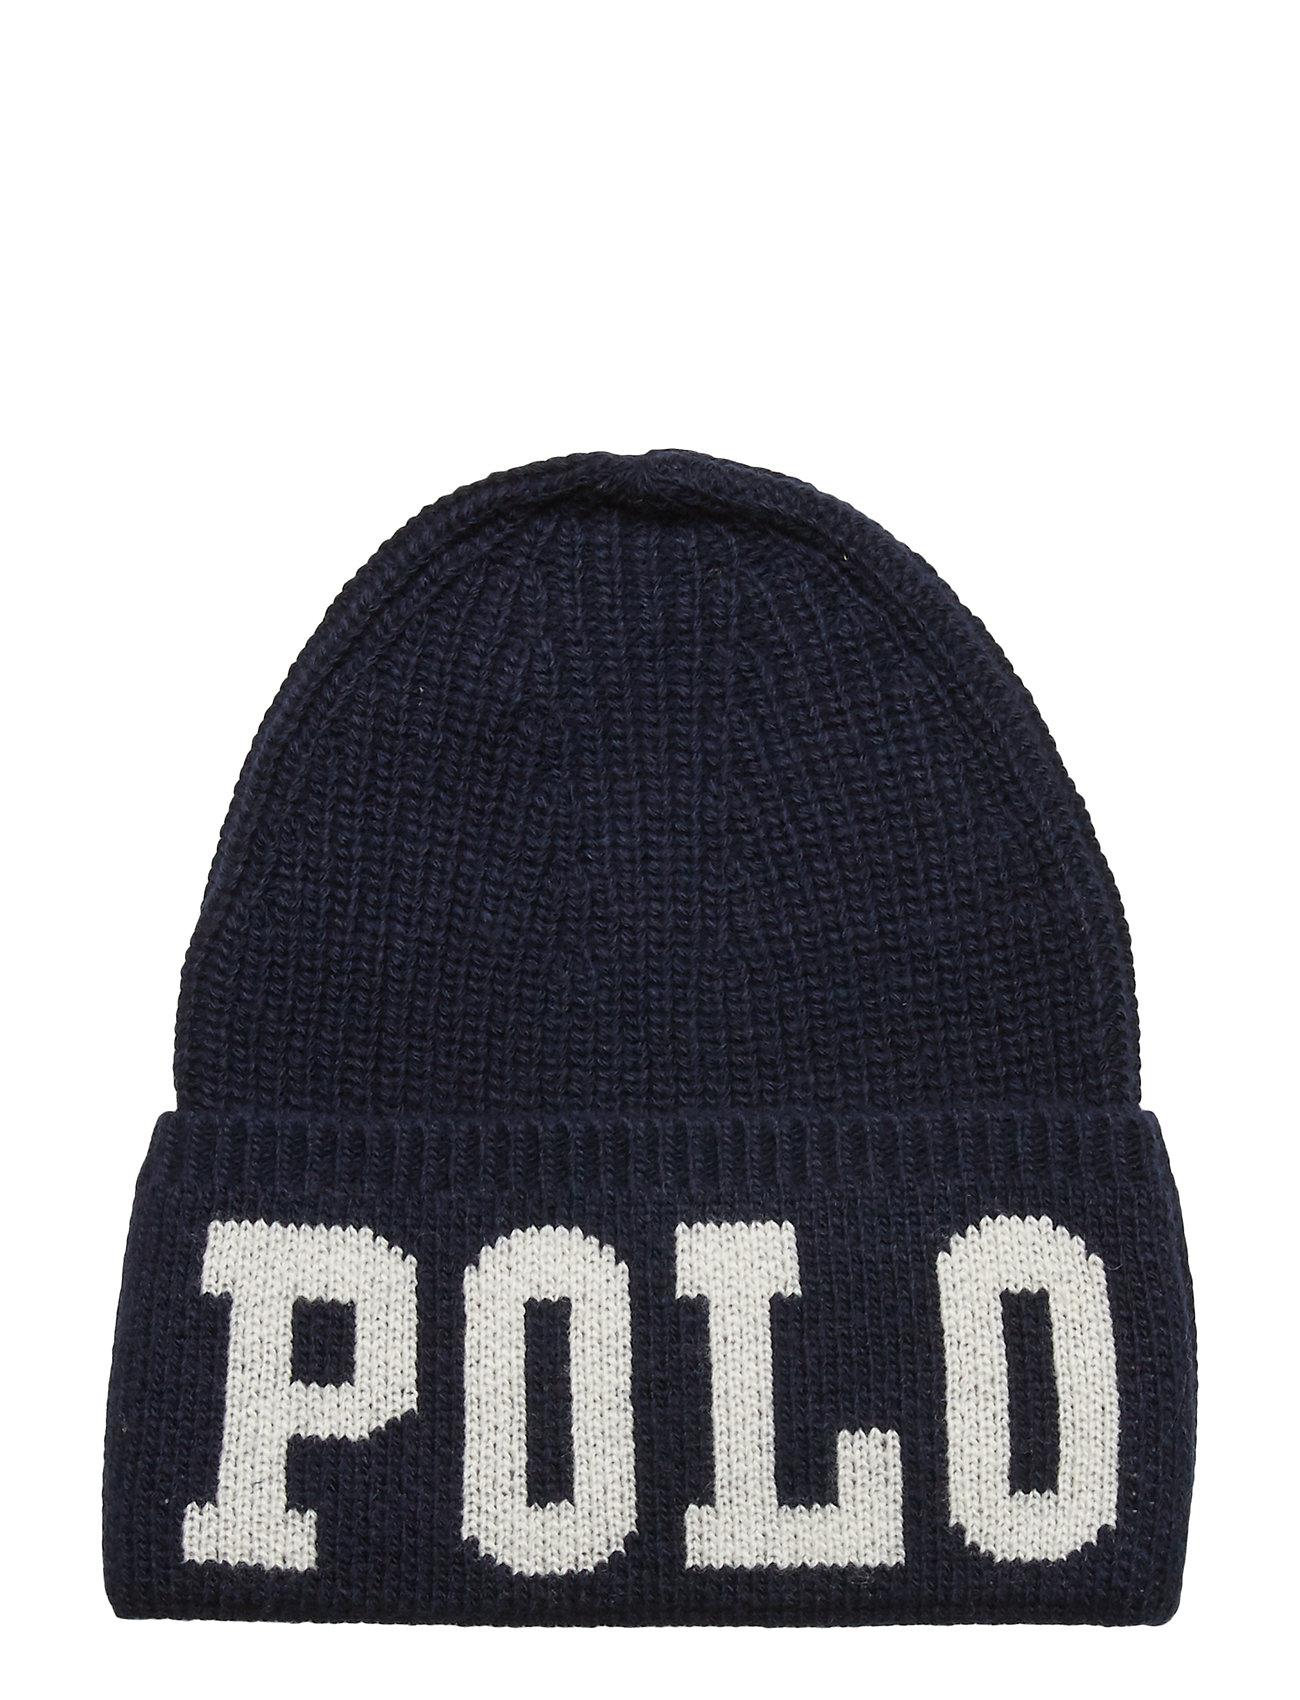 Ralph Lauren Kids POLO HAT-APPAREL ACCESSORIES-HAT - RL NAVY